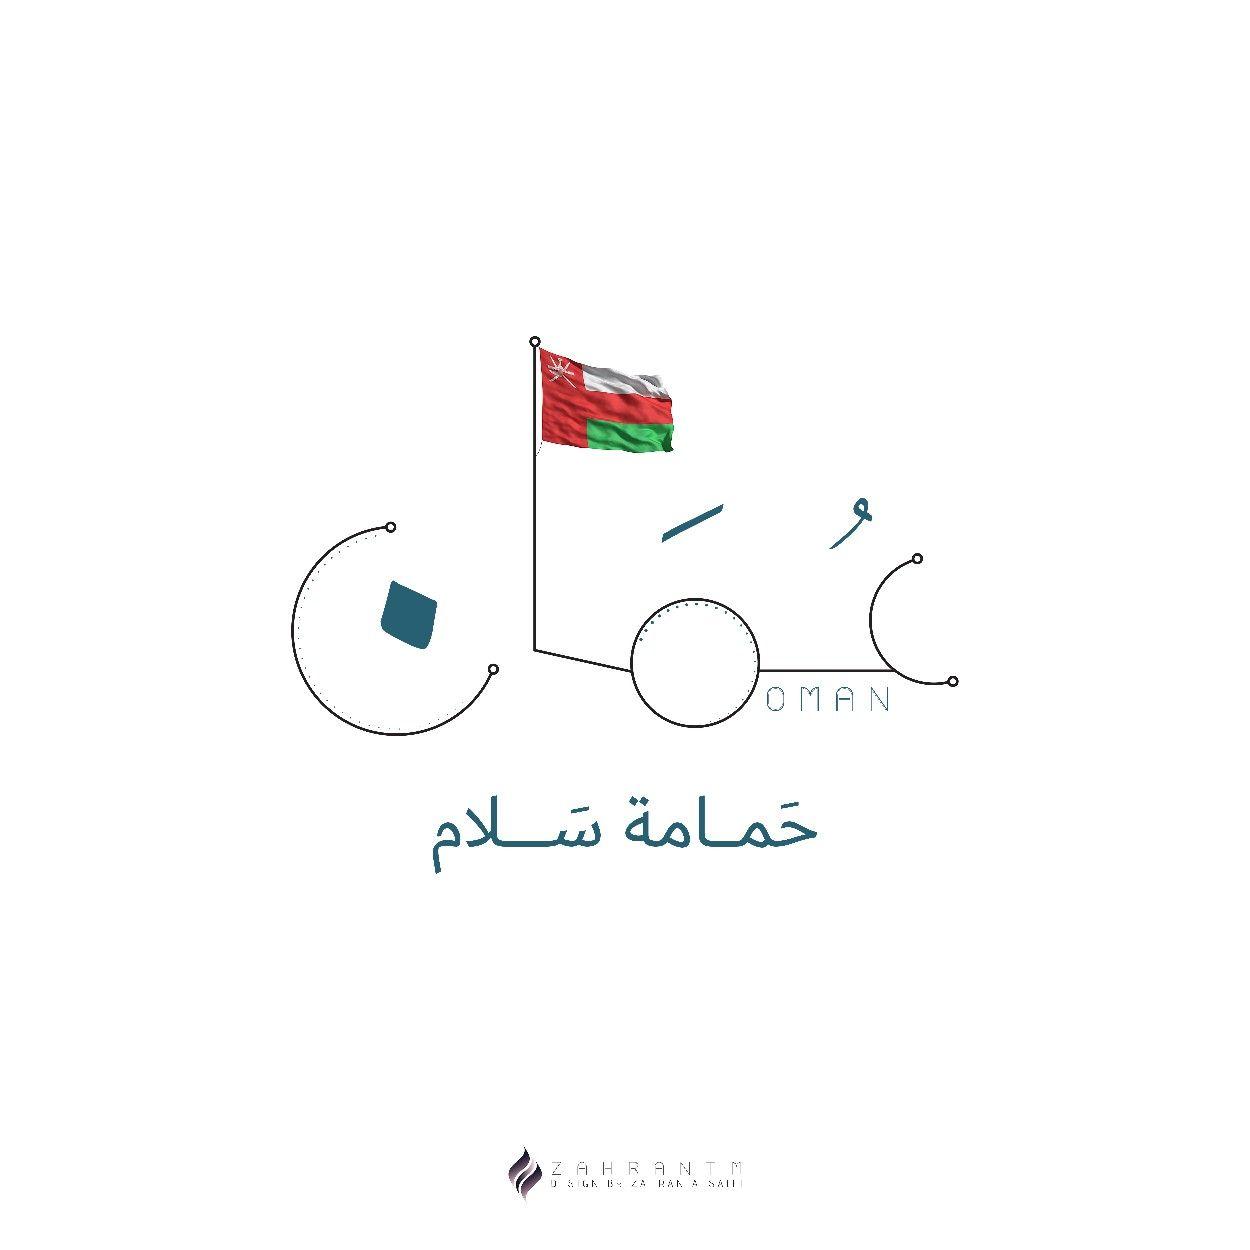 Oman Peace ع مان حمامة سلام Oman National Day Sultan Qaboos